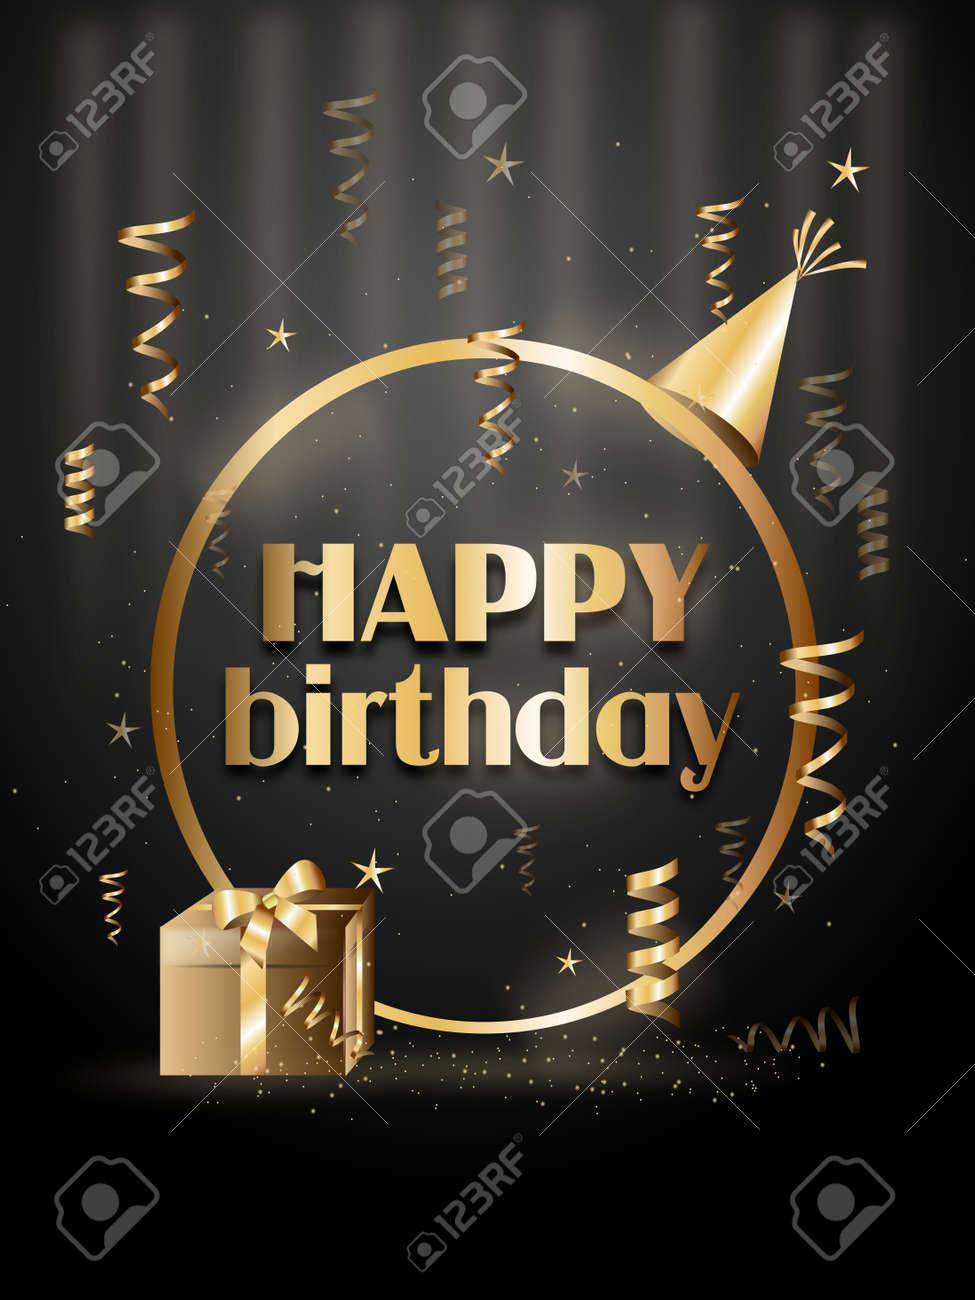 Golden Black Happy Birthday Greeting Card Illustration